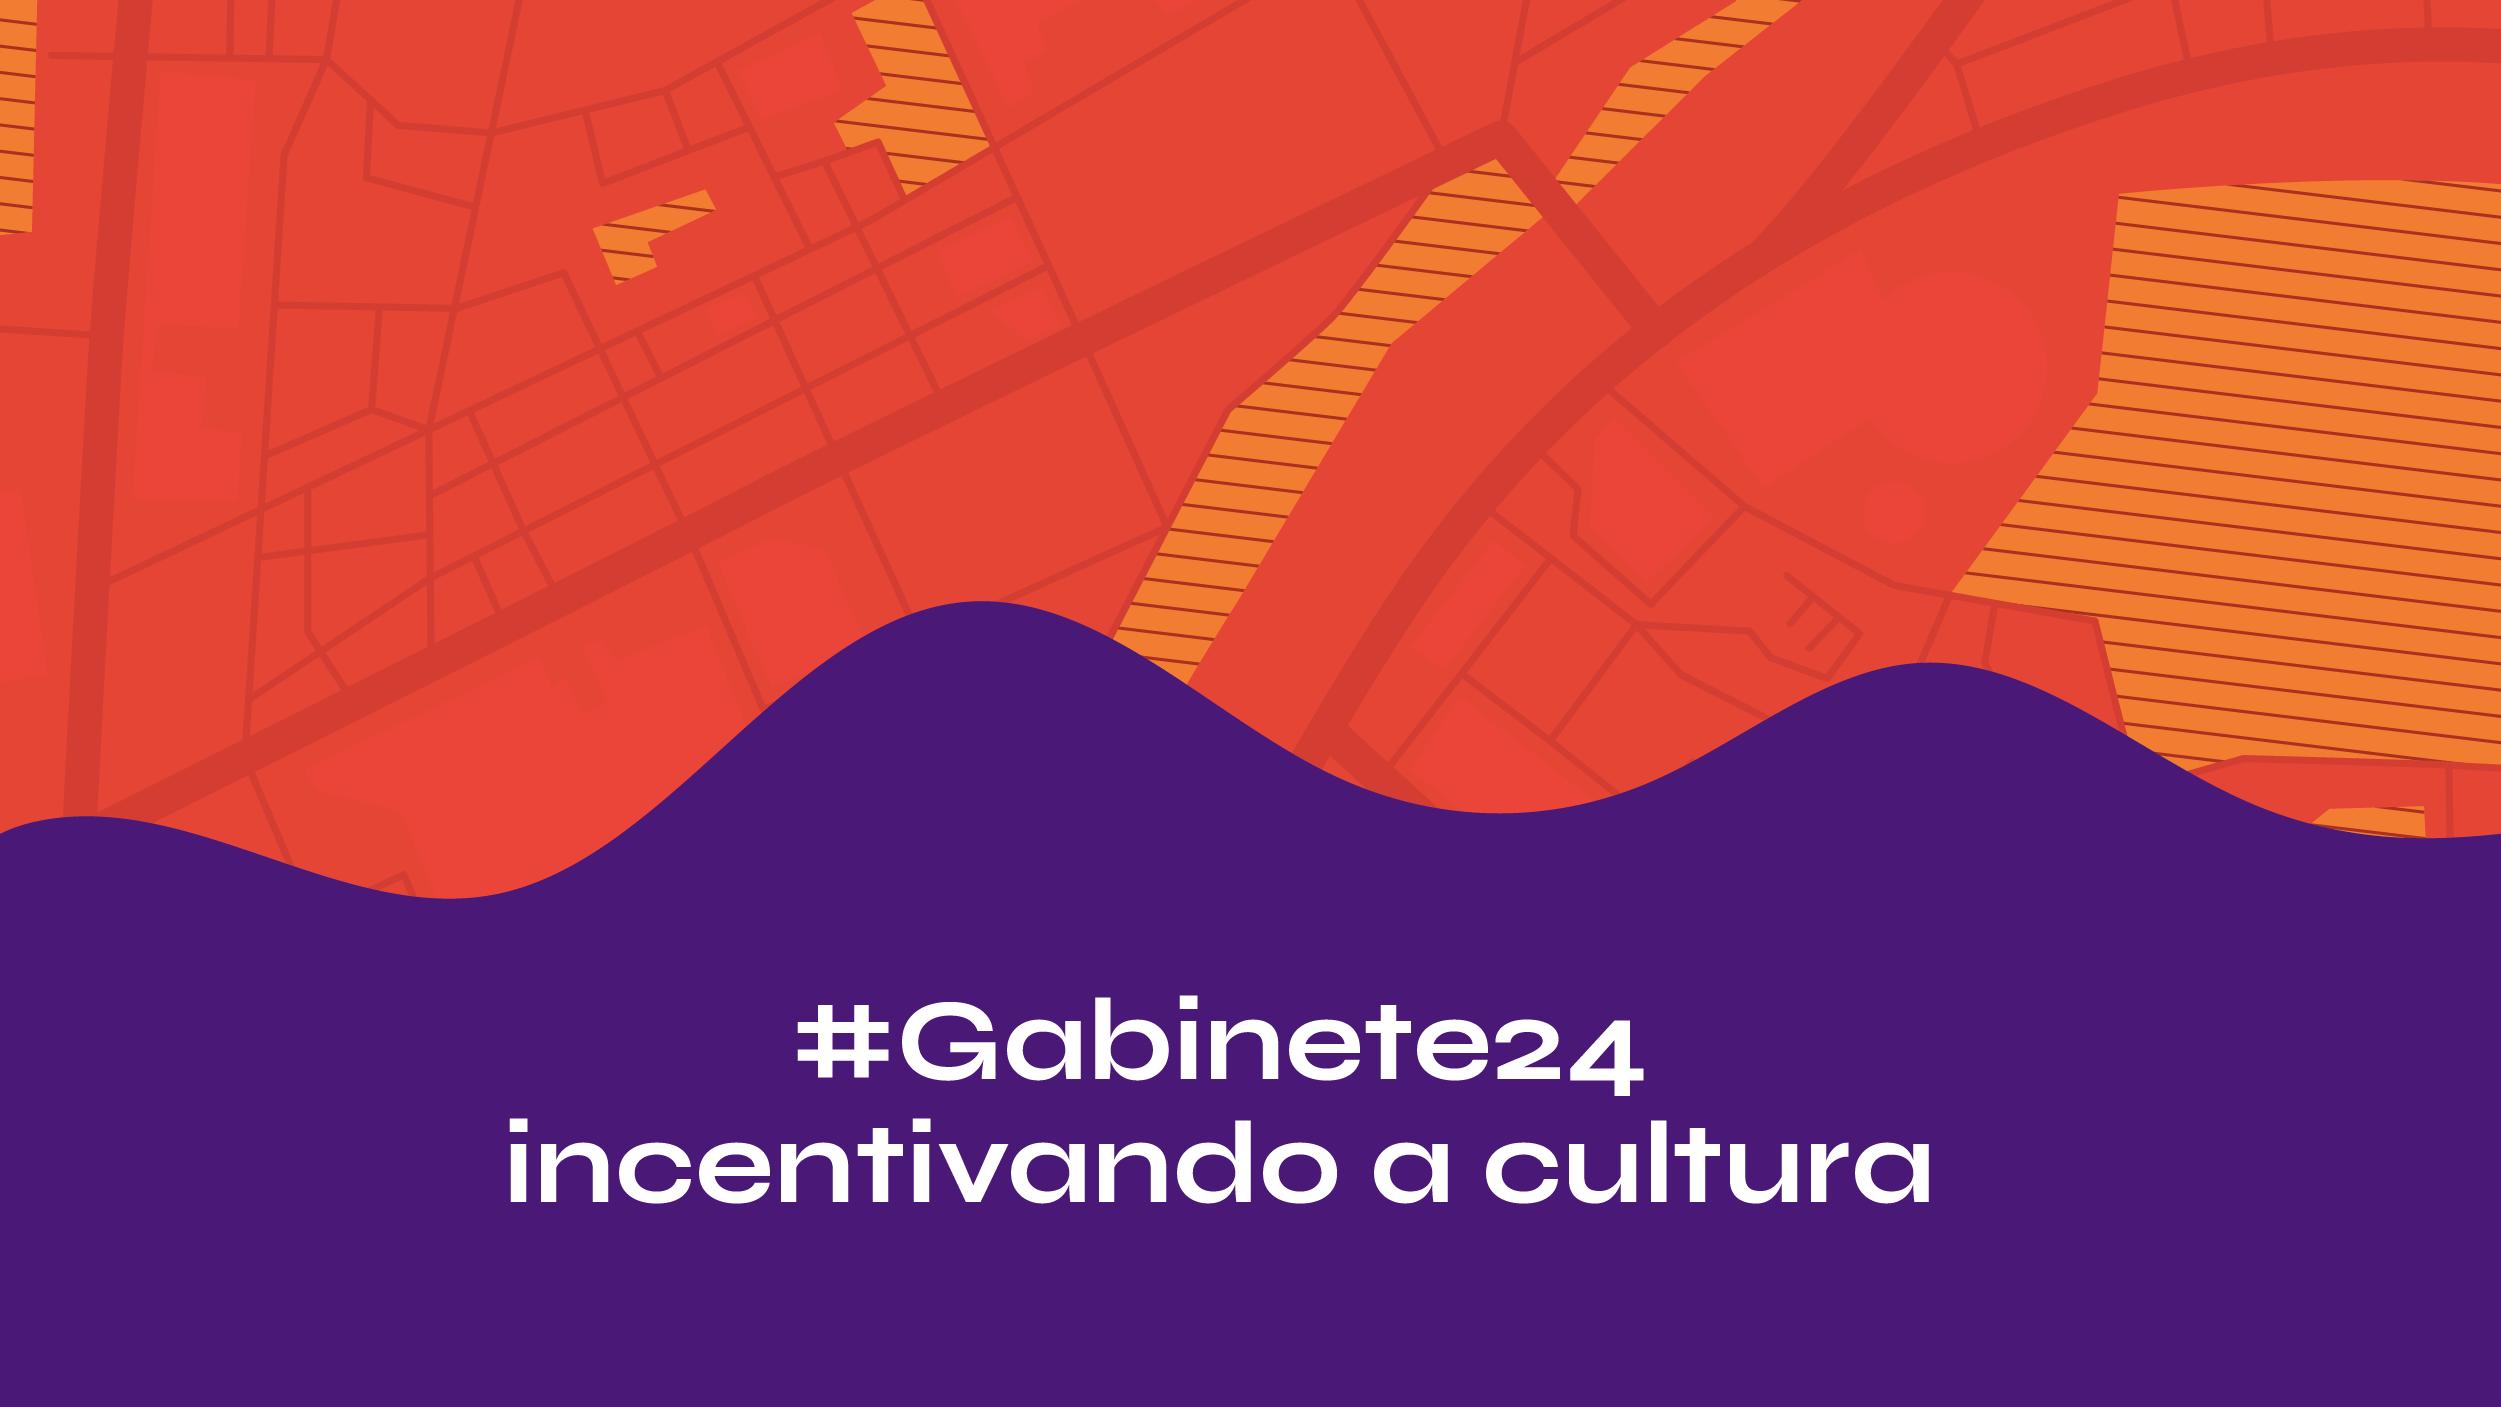 Emenda do Gabinete 24 viabiliza projeto Territórios Culturais